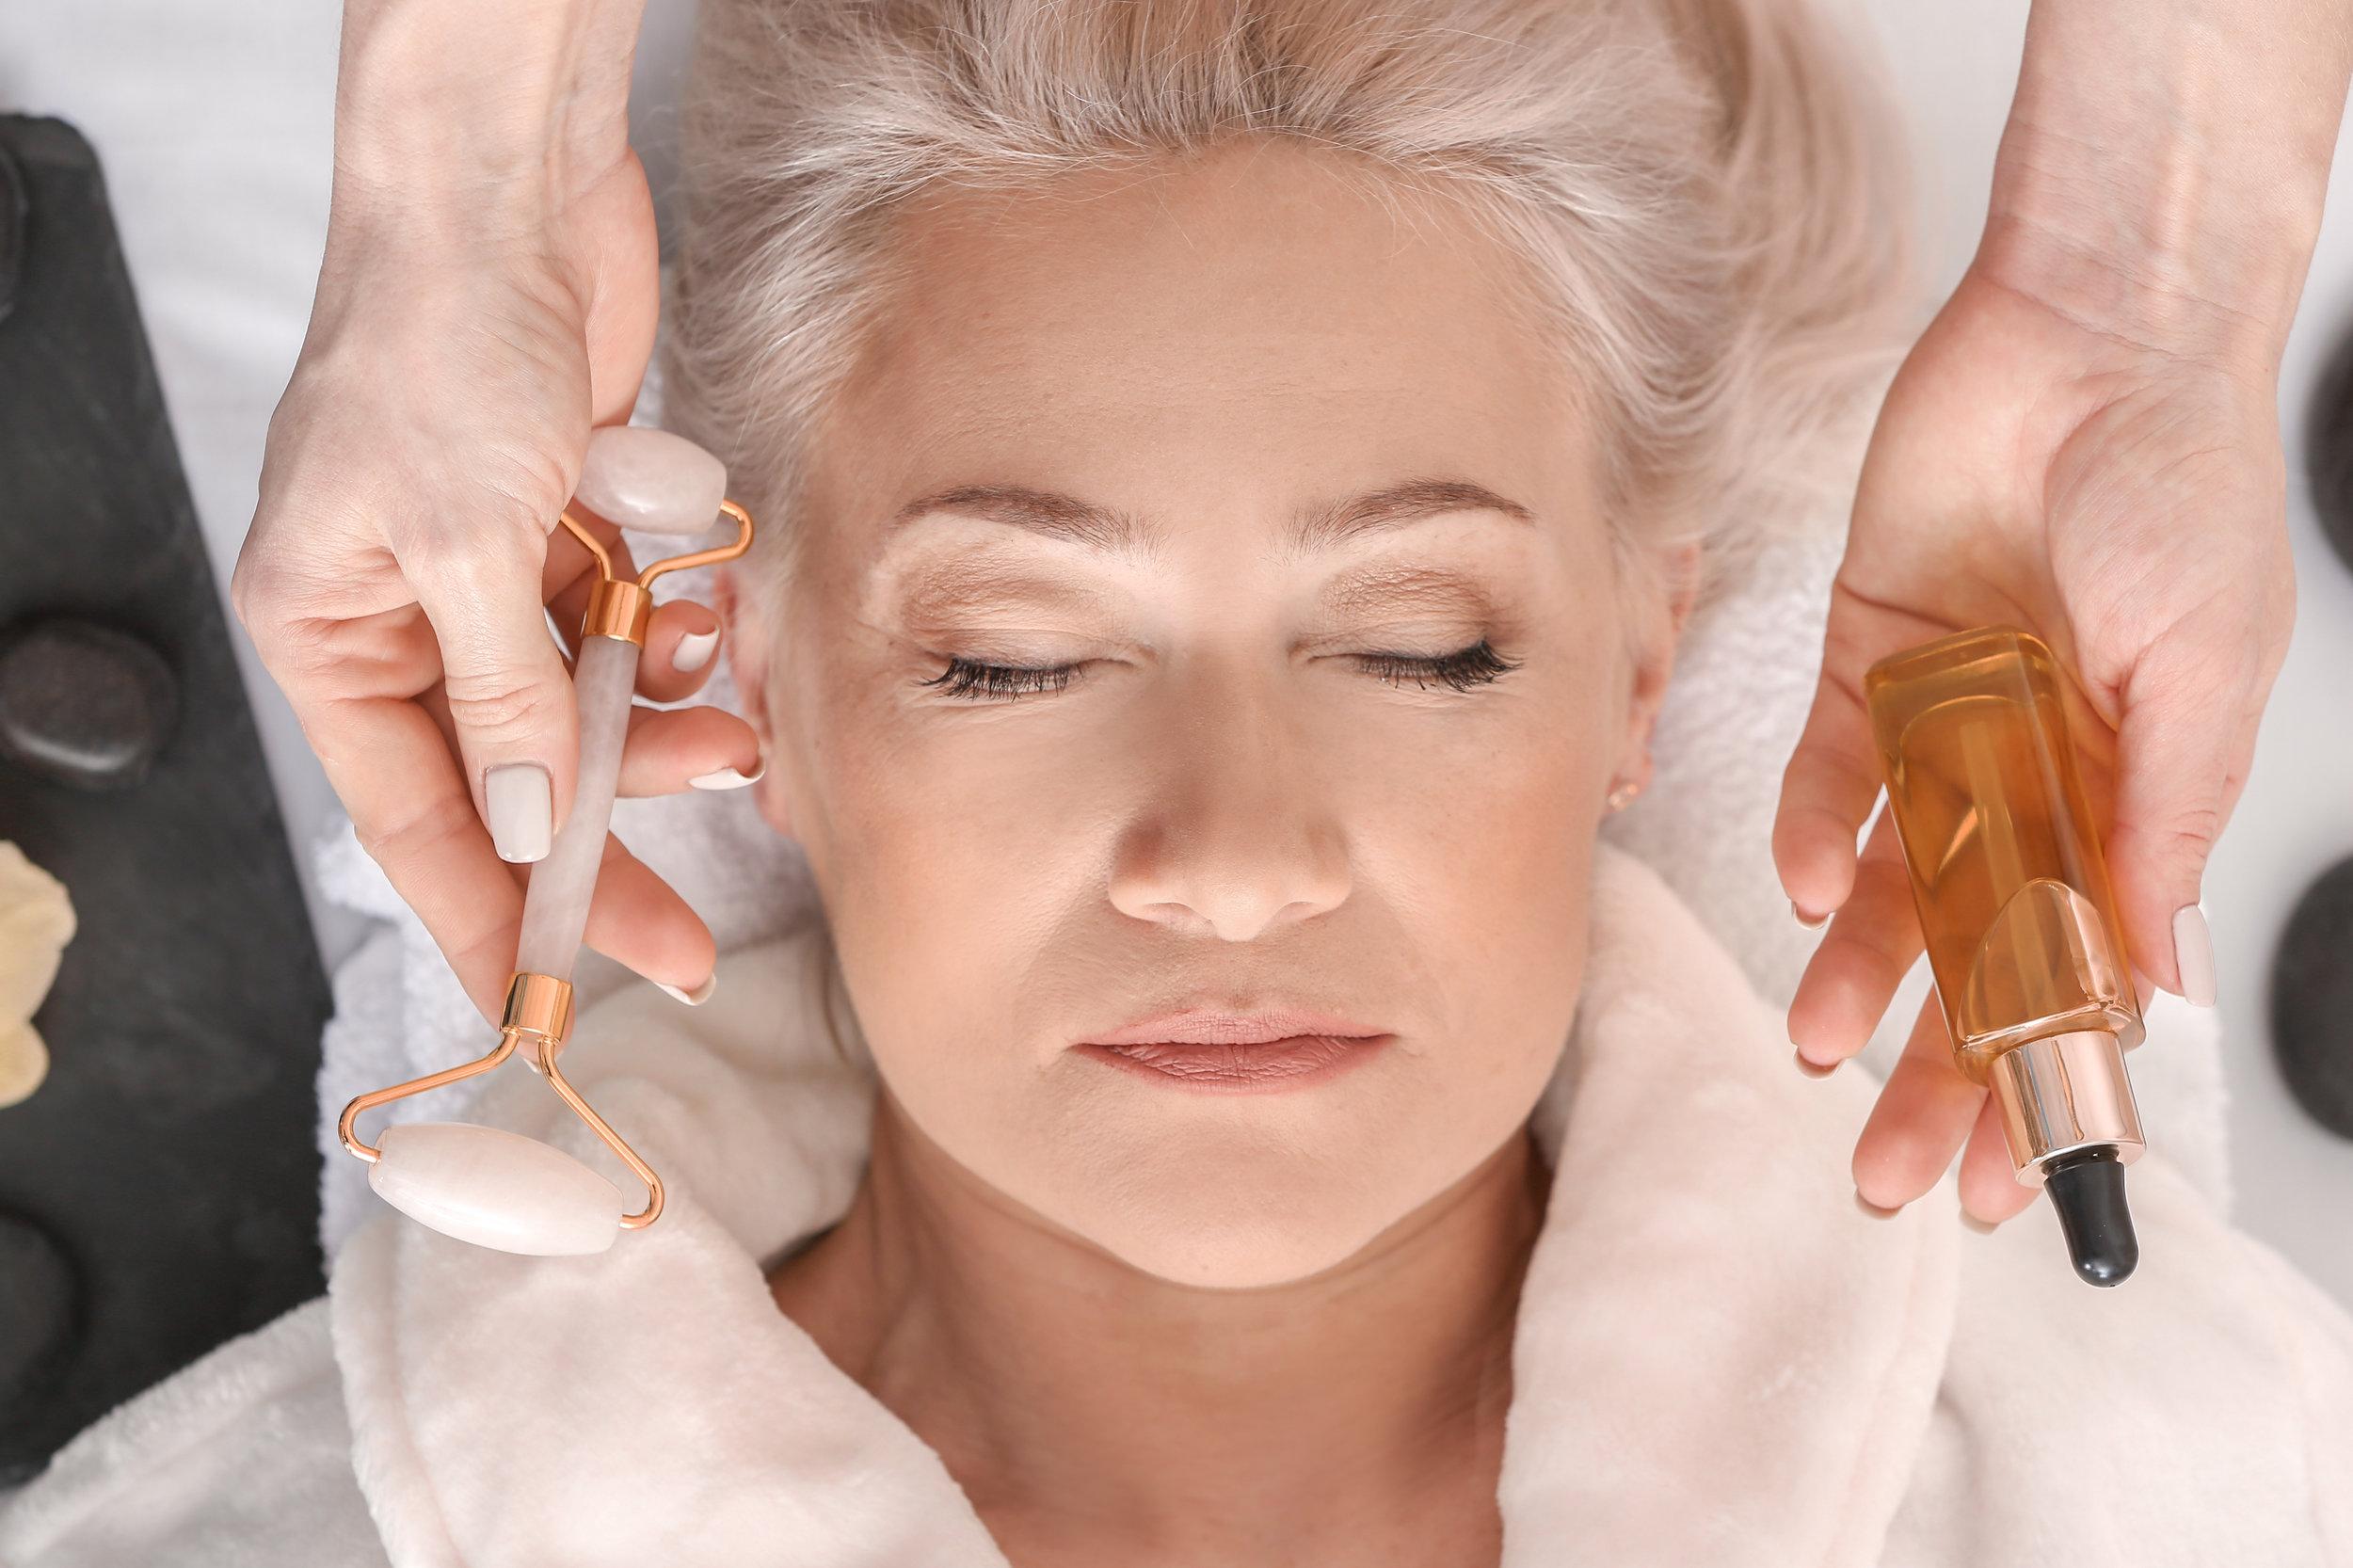 Mature woman undergoing treatment in beauty salon